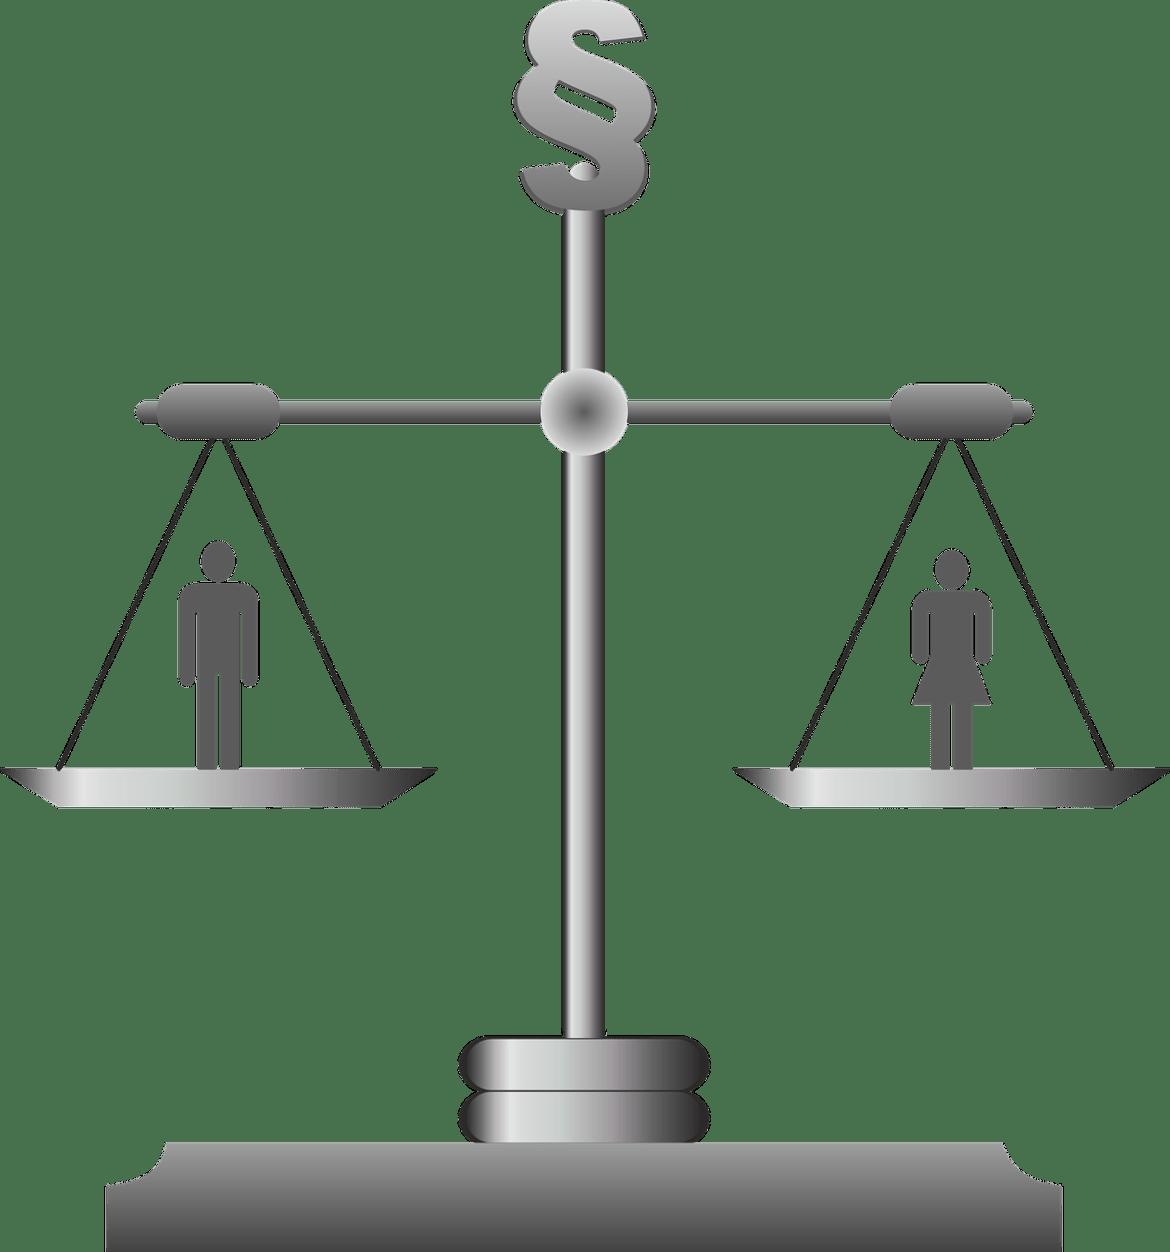 https://pixabay.com/en/horizontal-justice-right-law-1452535/